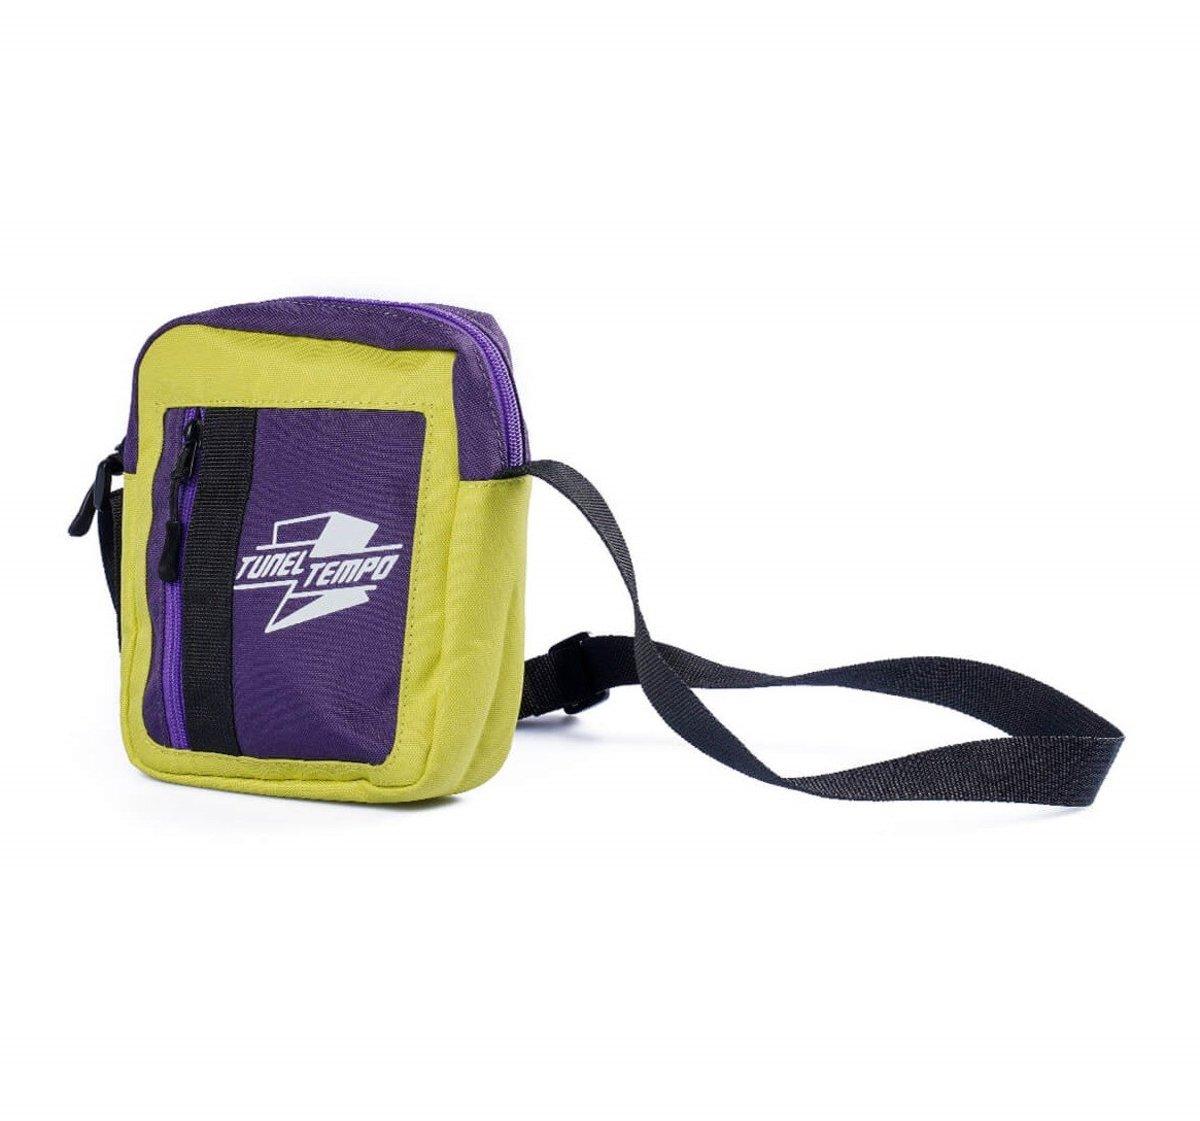 Tunnel Tempo green-purple cross body bags small haversack